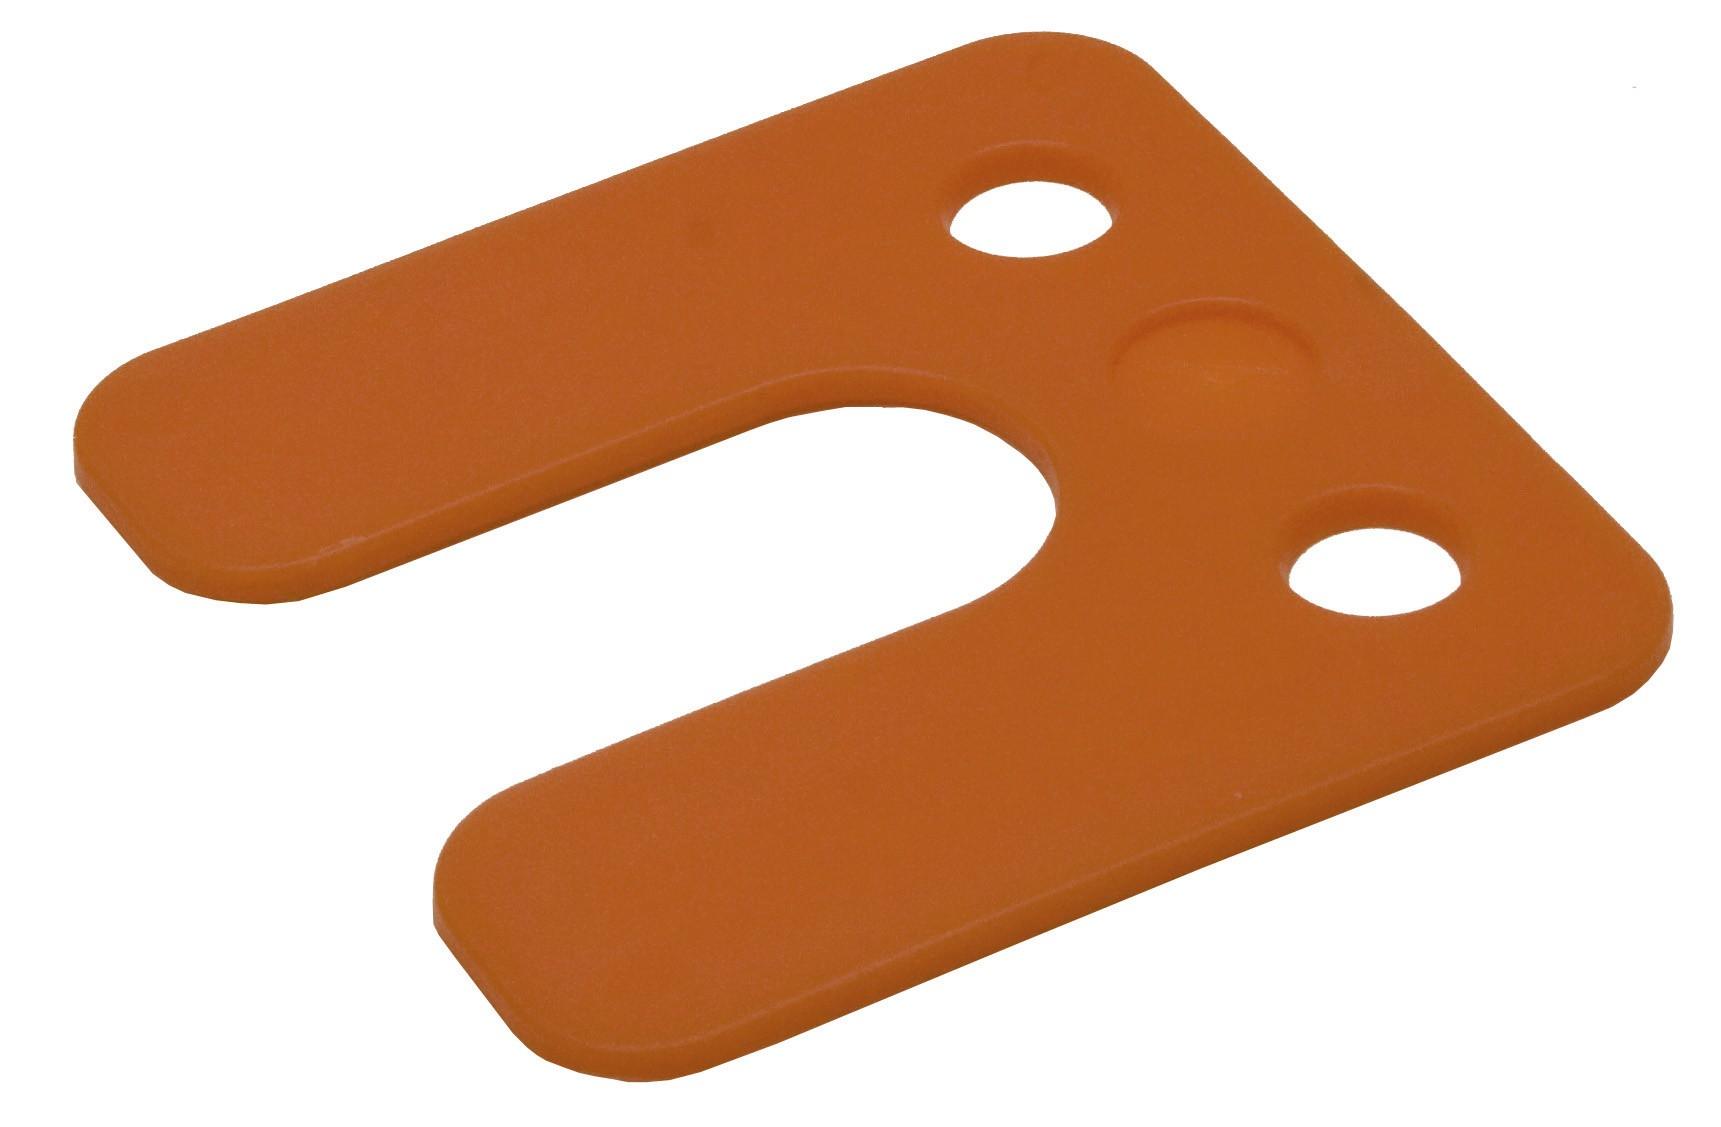 Drukplaat met sleuf oranje 2 70x70 KS